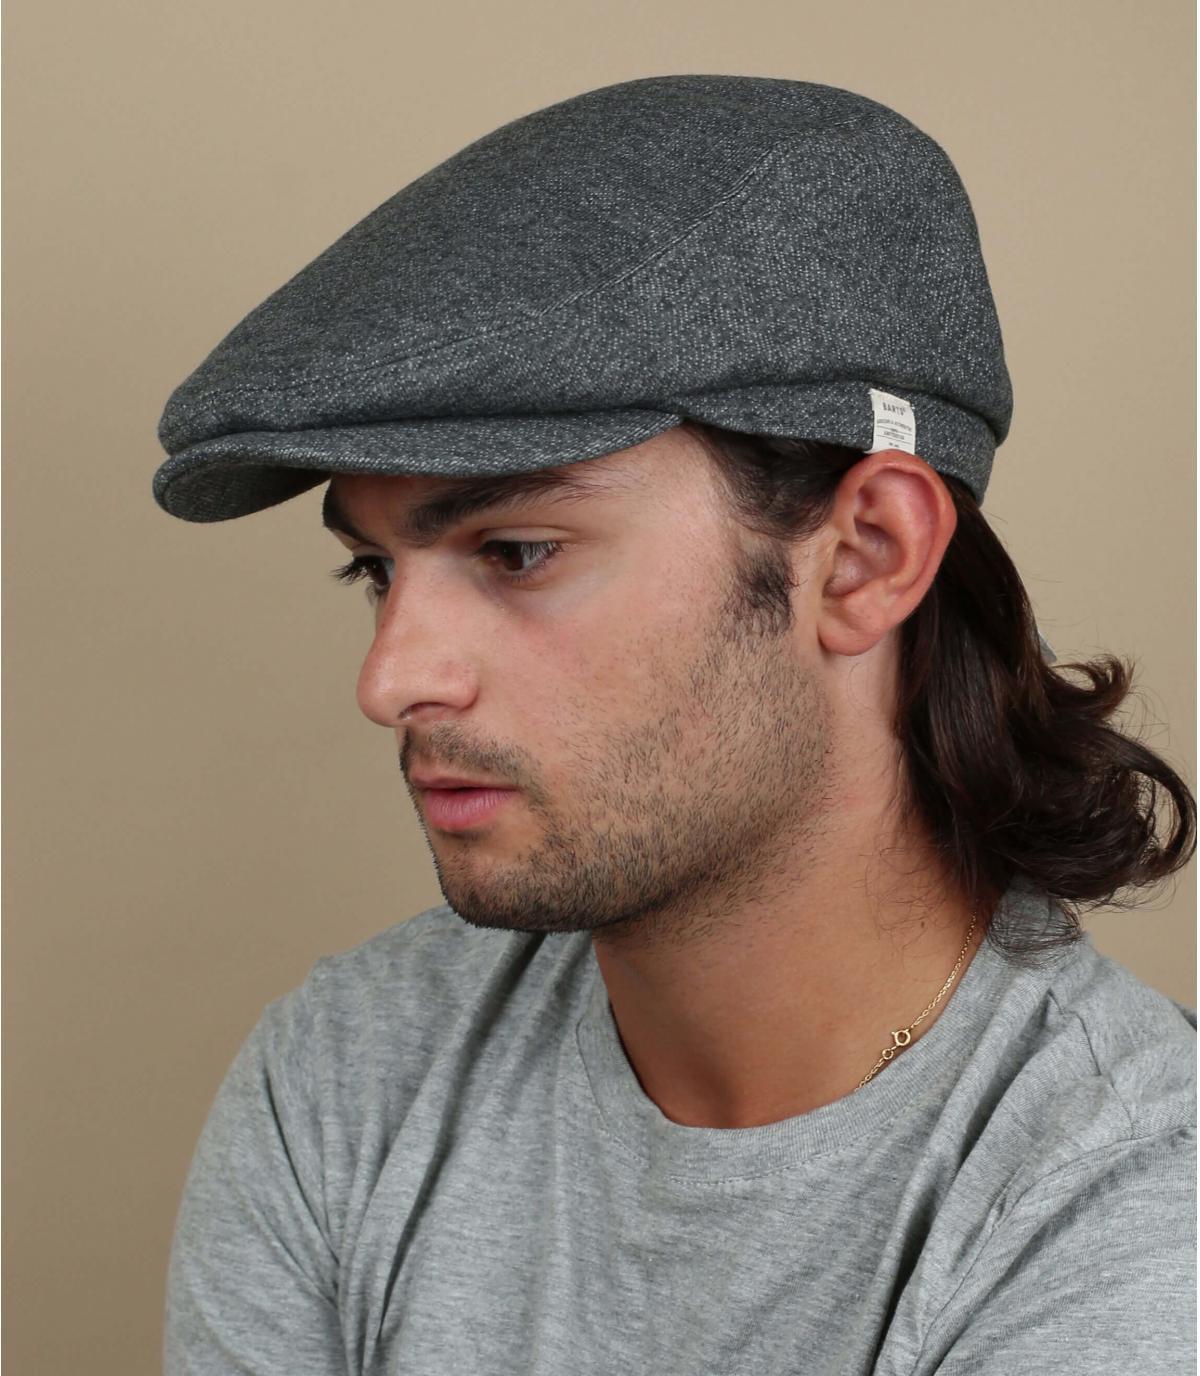 katoenen linnen grijze baret